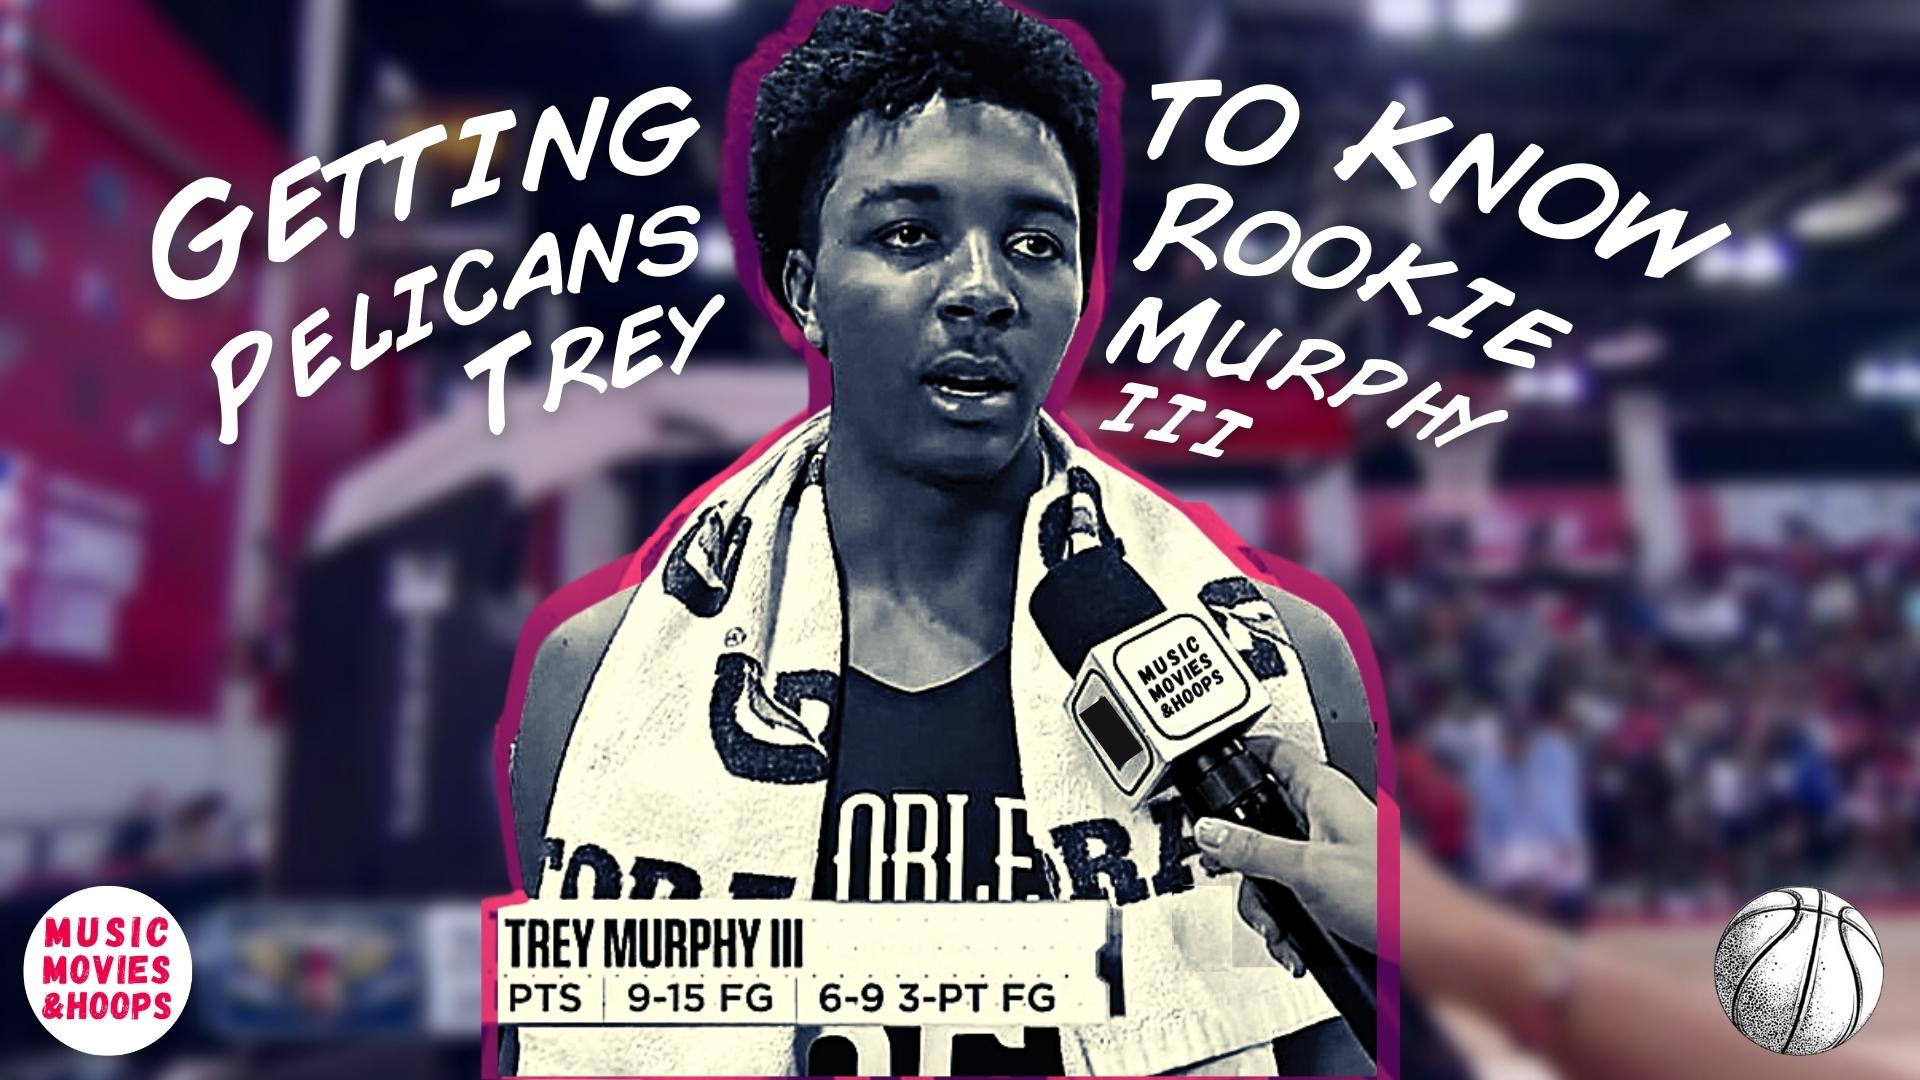 Getting to Know Trey Murphy III